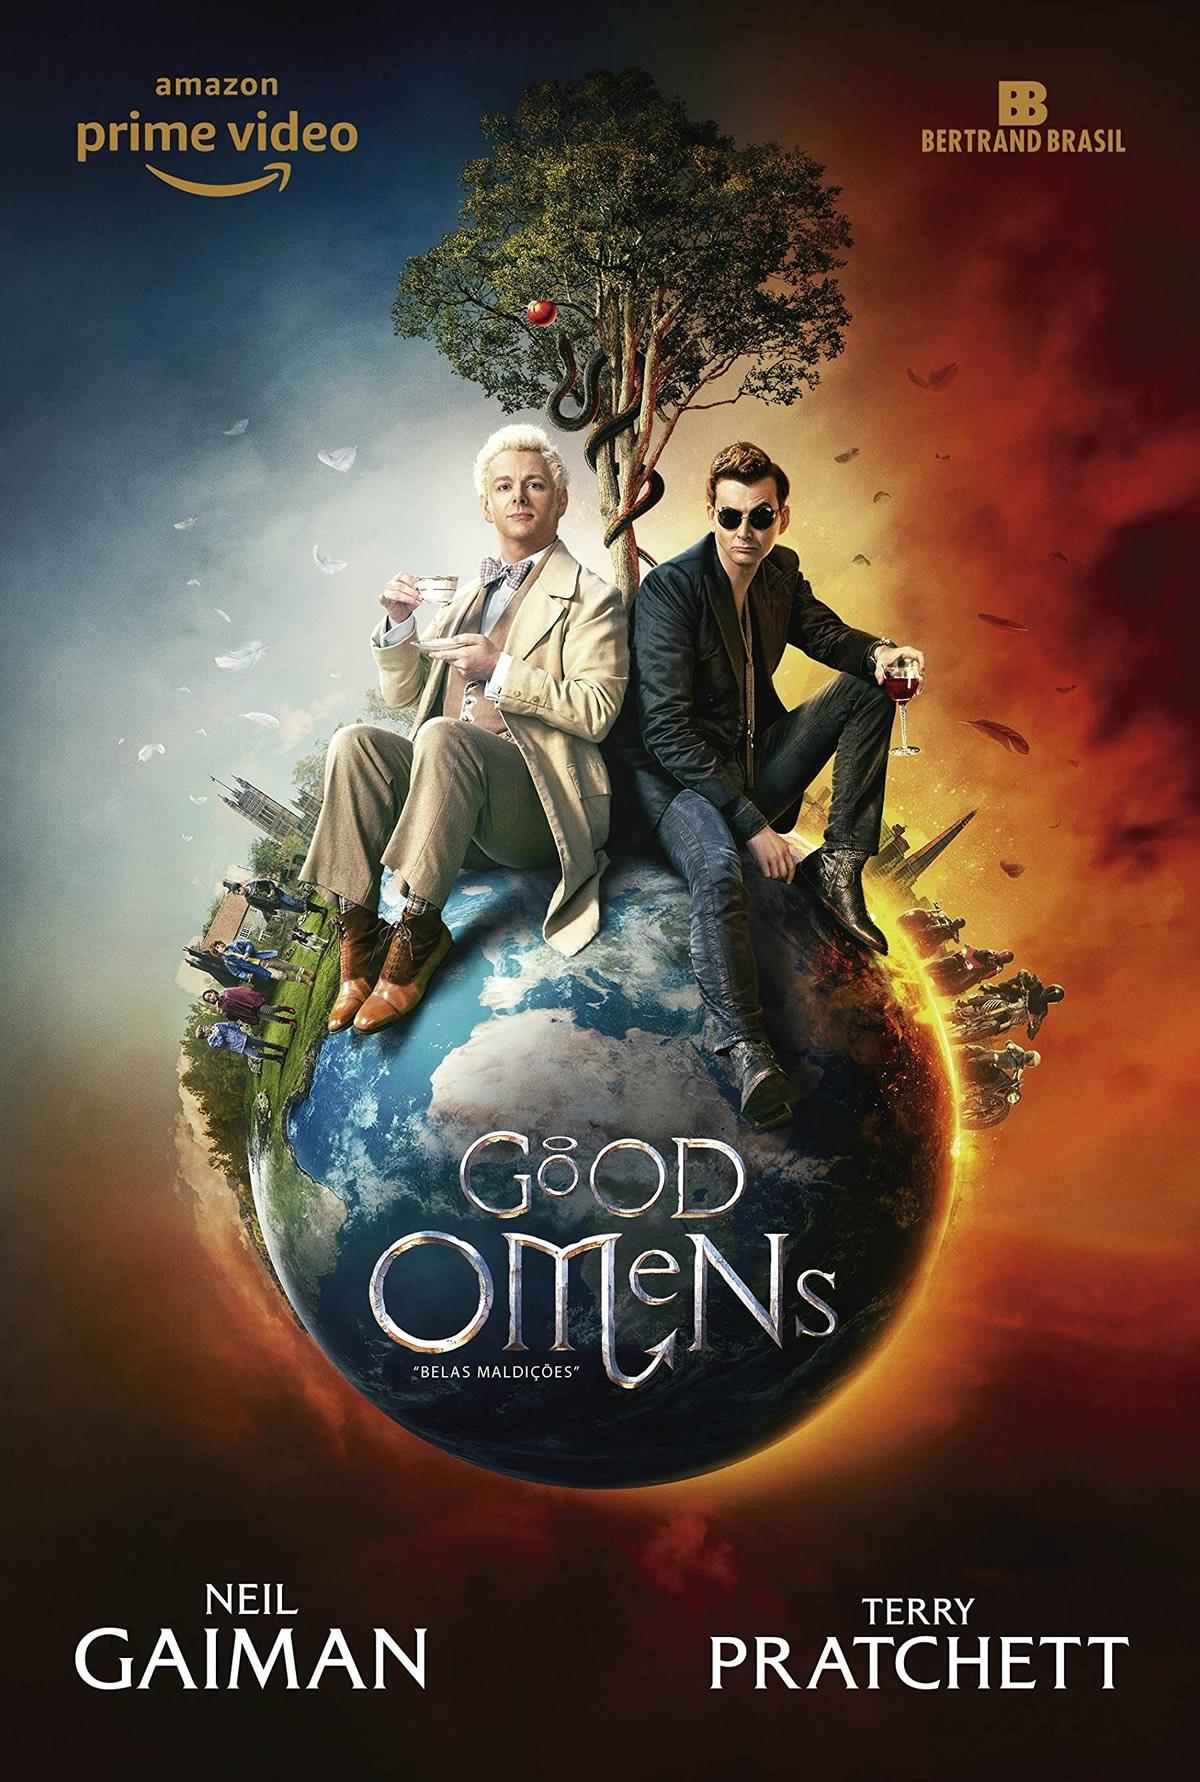 good omens amazon prime video renova para segunda temporada serie de neil gaiman e terry pratchett poster - GOOD OMENS | Amazon Prime Vídeo renova para segunda temporada a série de Neil Gaiman e Terry Pratchett